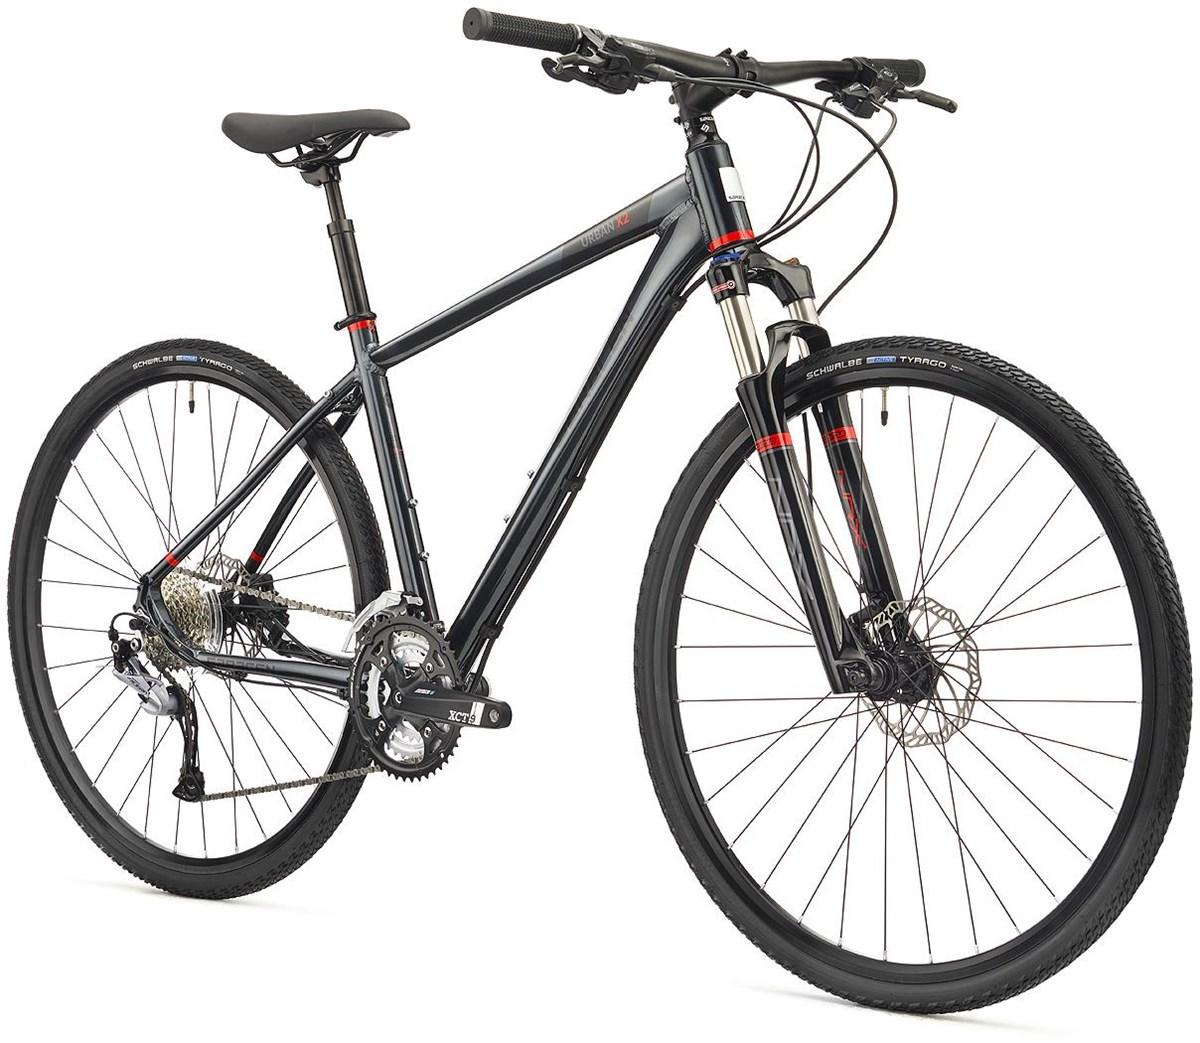 Saracen Urban Cross 2 2018 - Hybrid Sports Bike | City